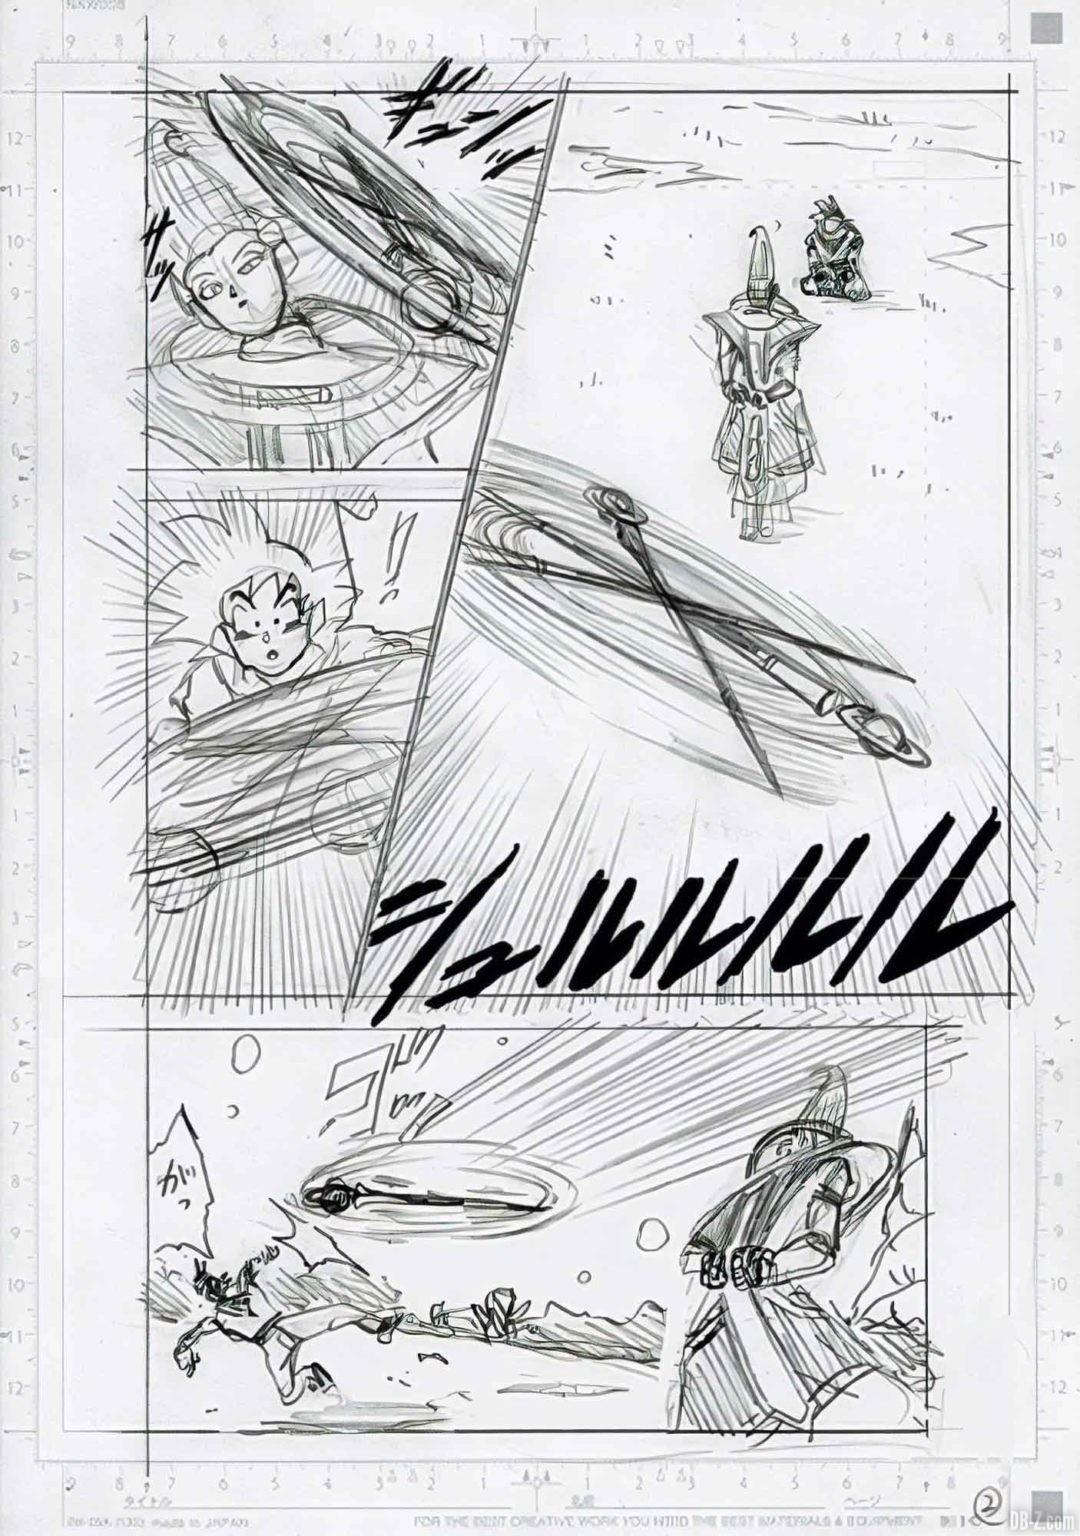 DBS-chap-71-Brouillon-Page-2